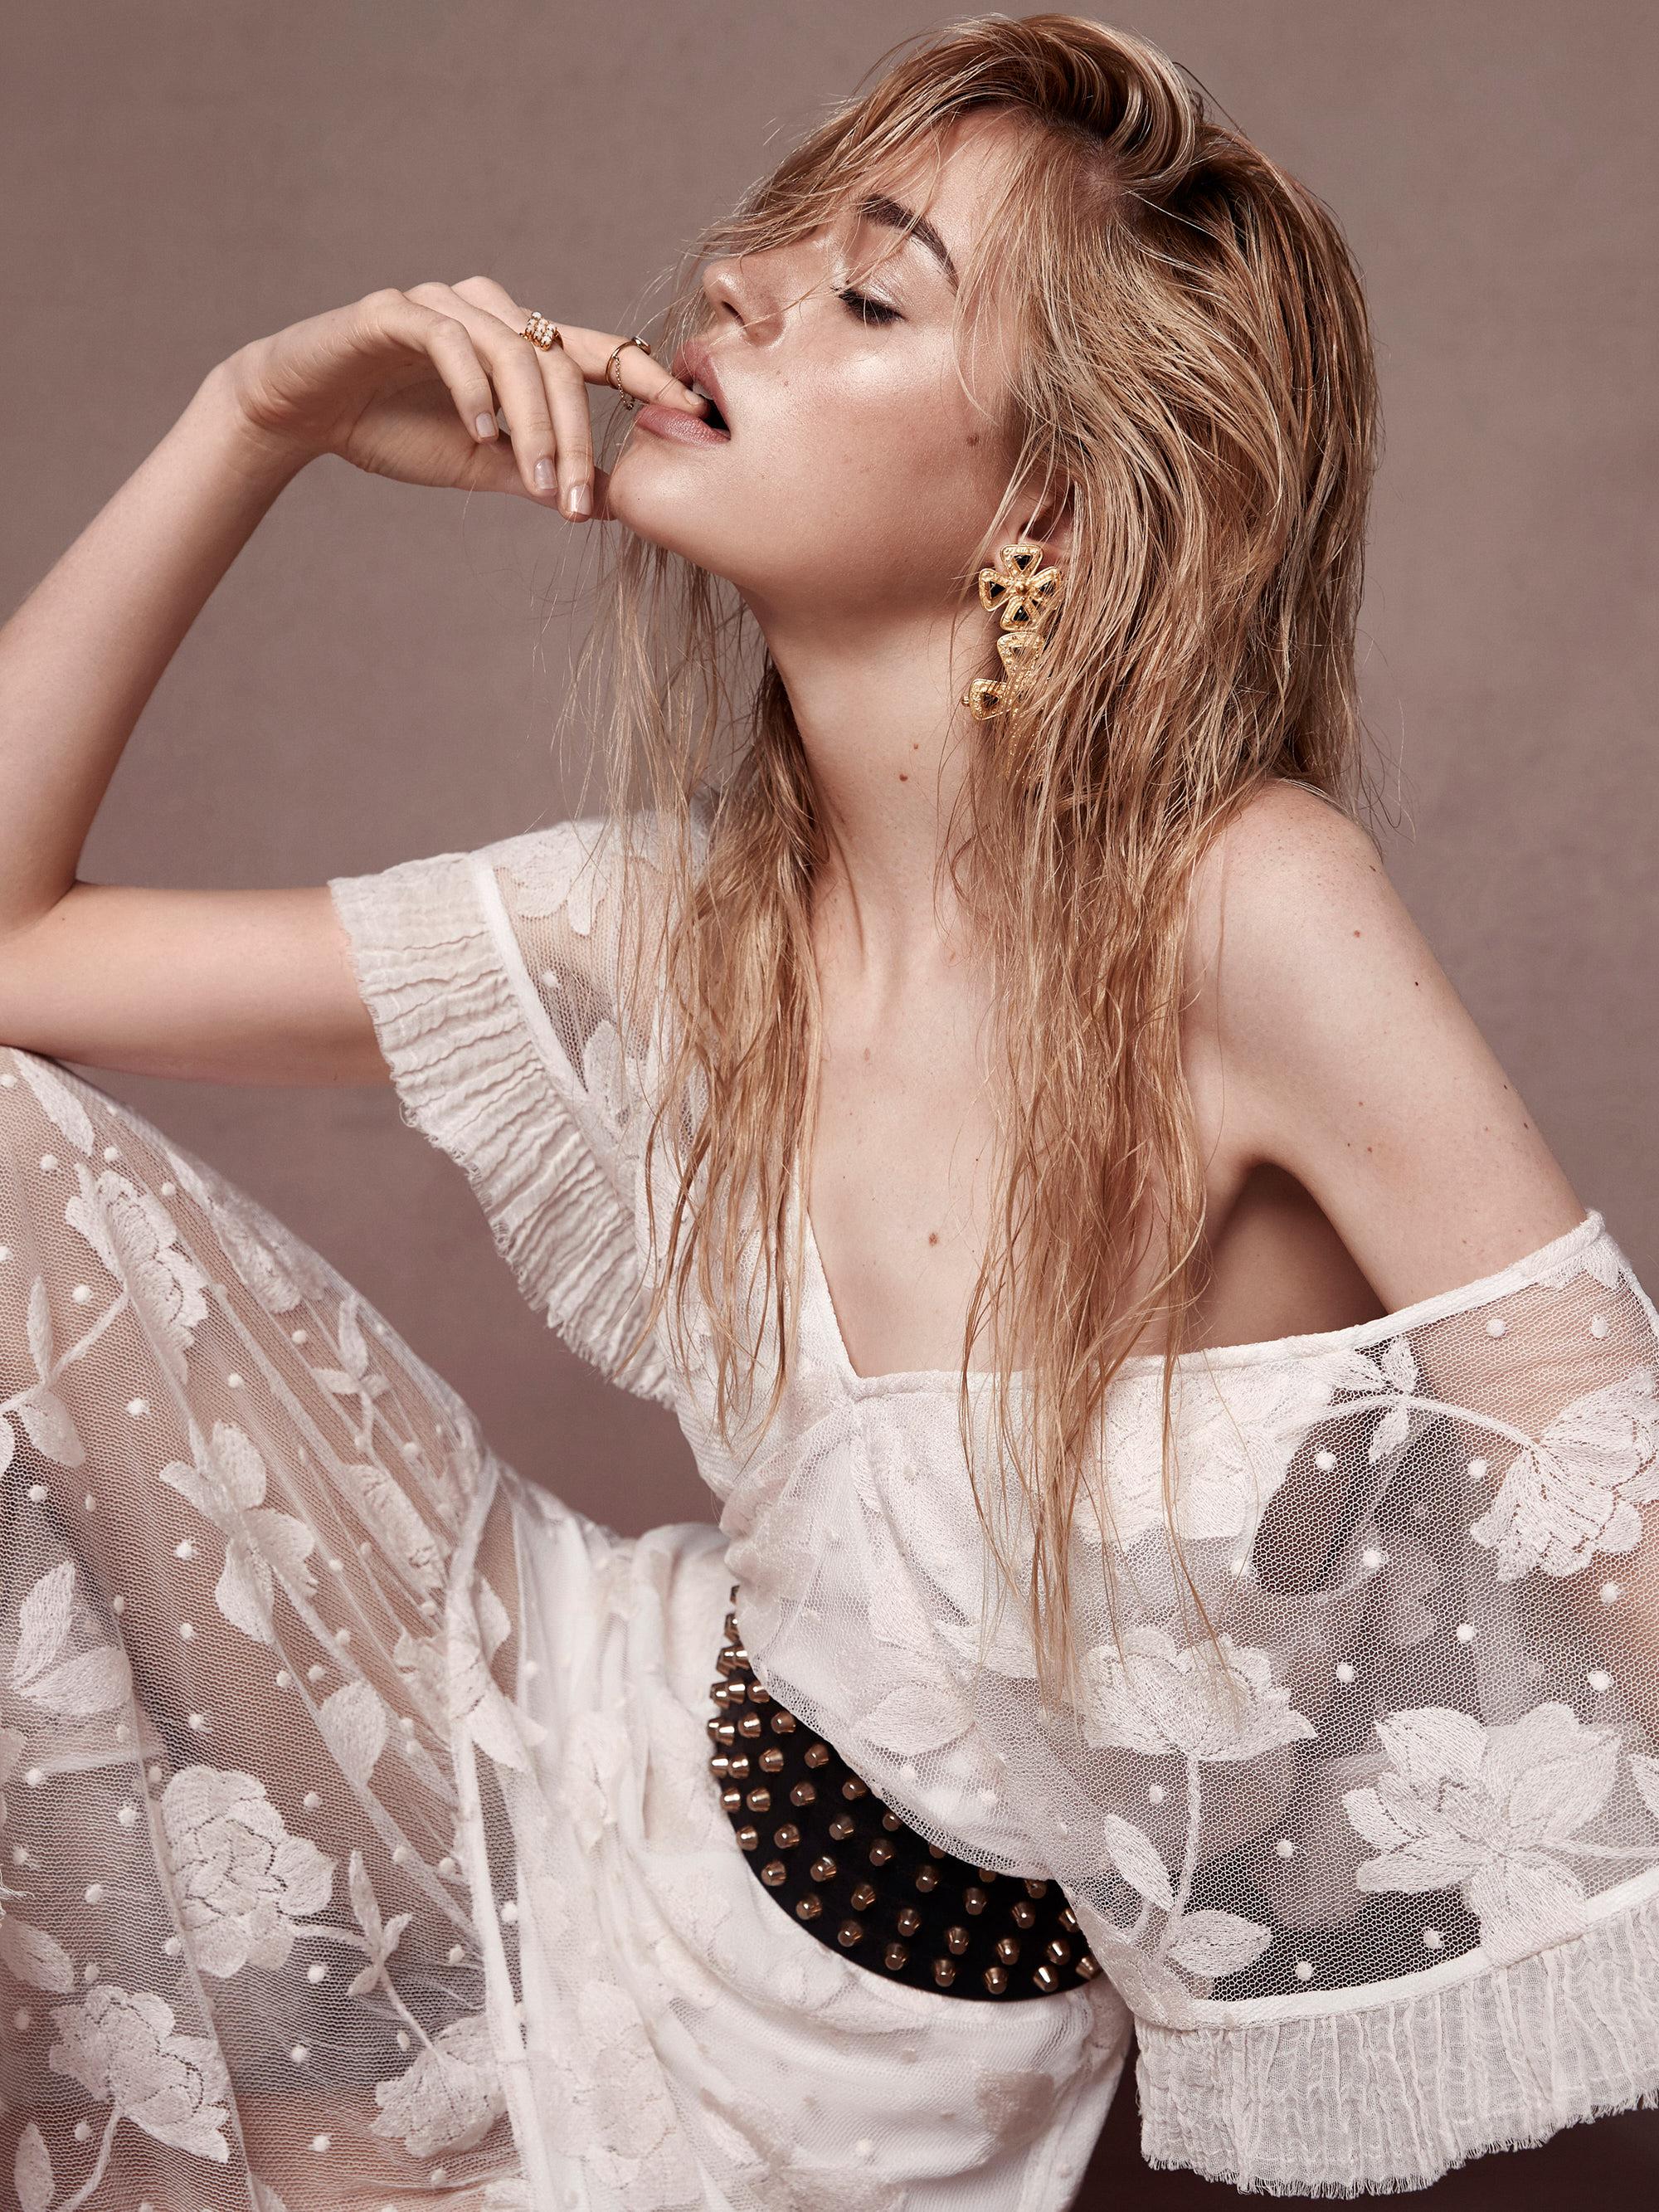 Sugar Rock by Simon Everiss for Fashion Journal by Simon Everiss.jpg